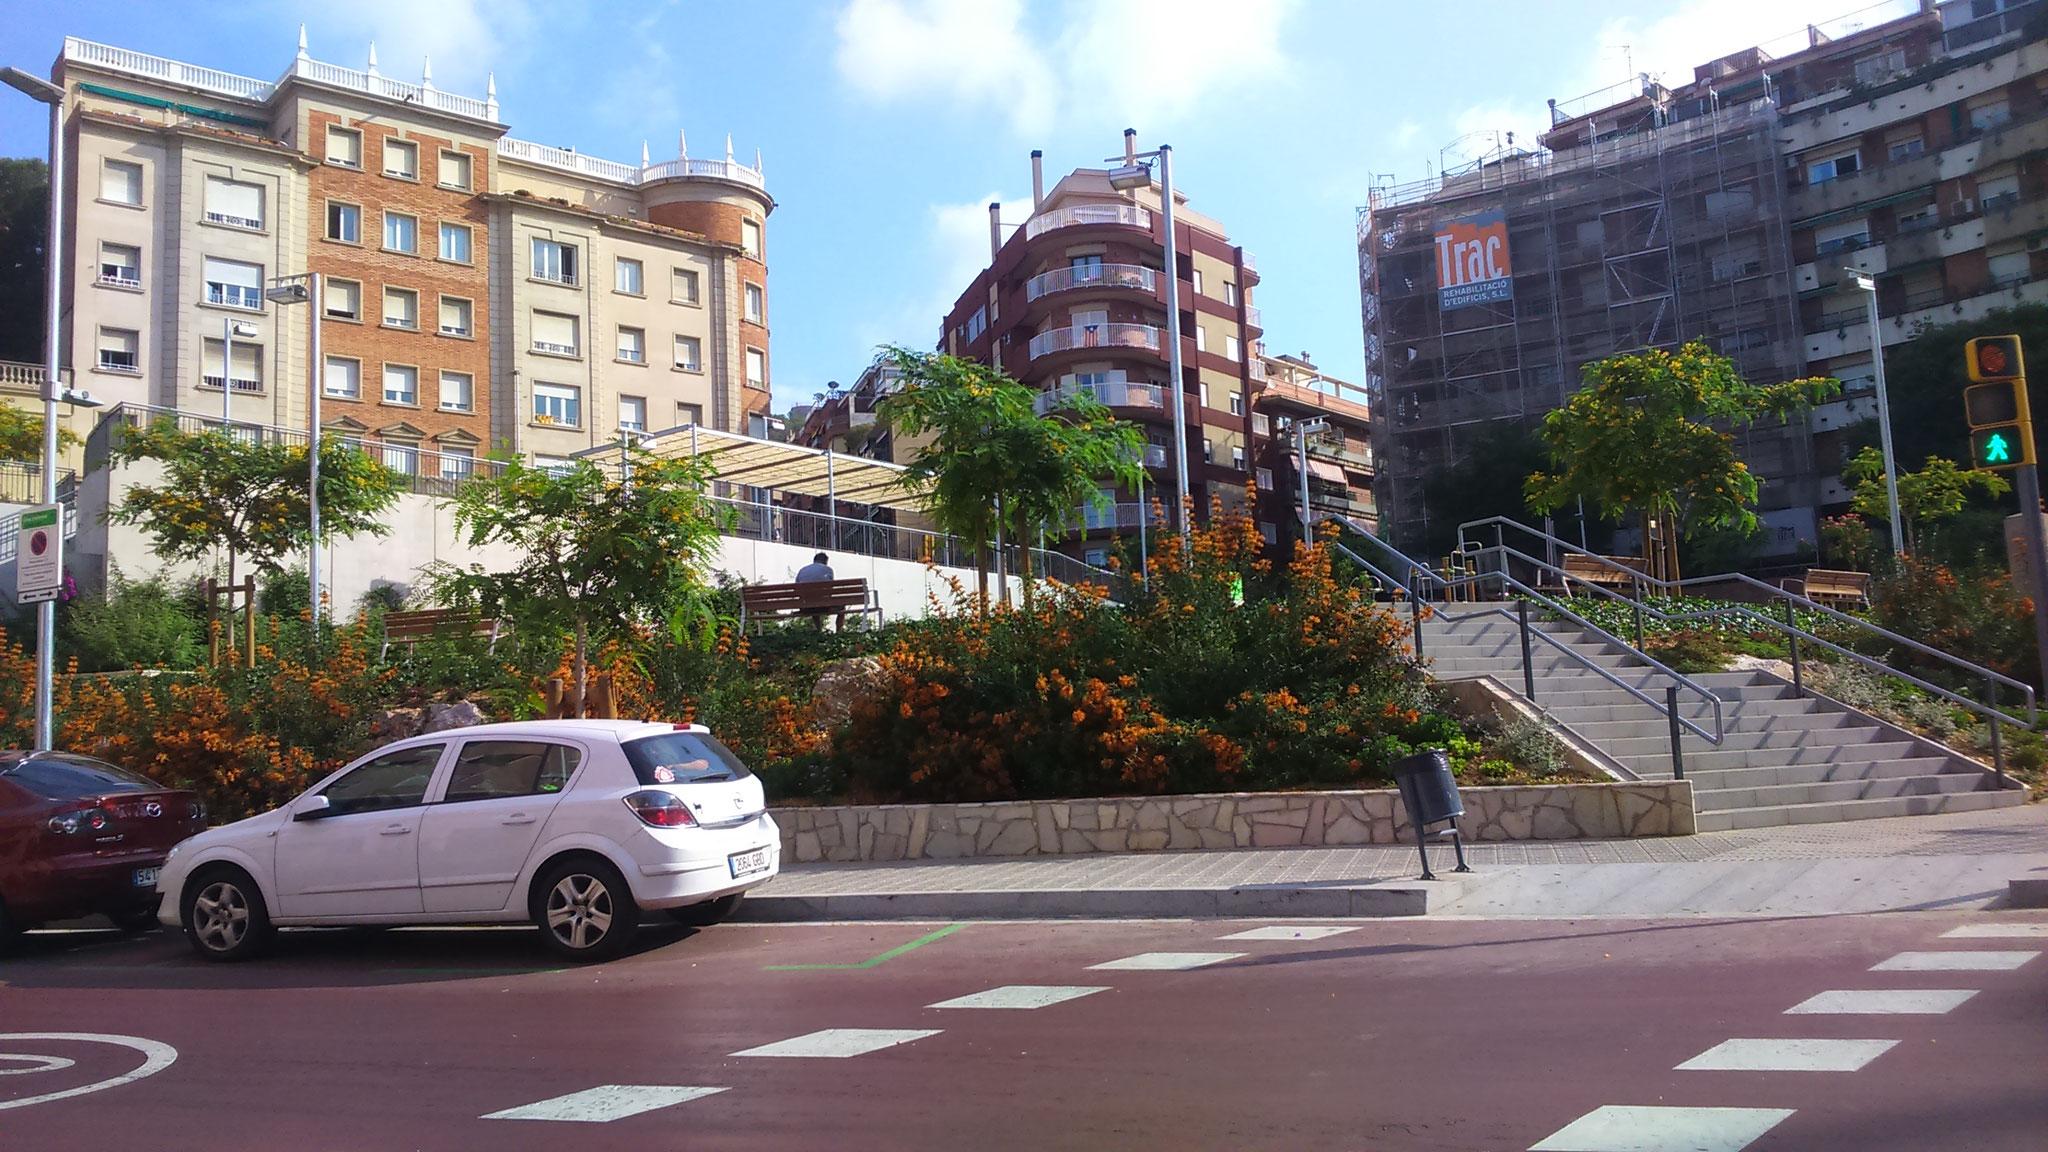 Comença l'aventura: la plaça Sanllehy